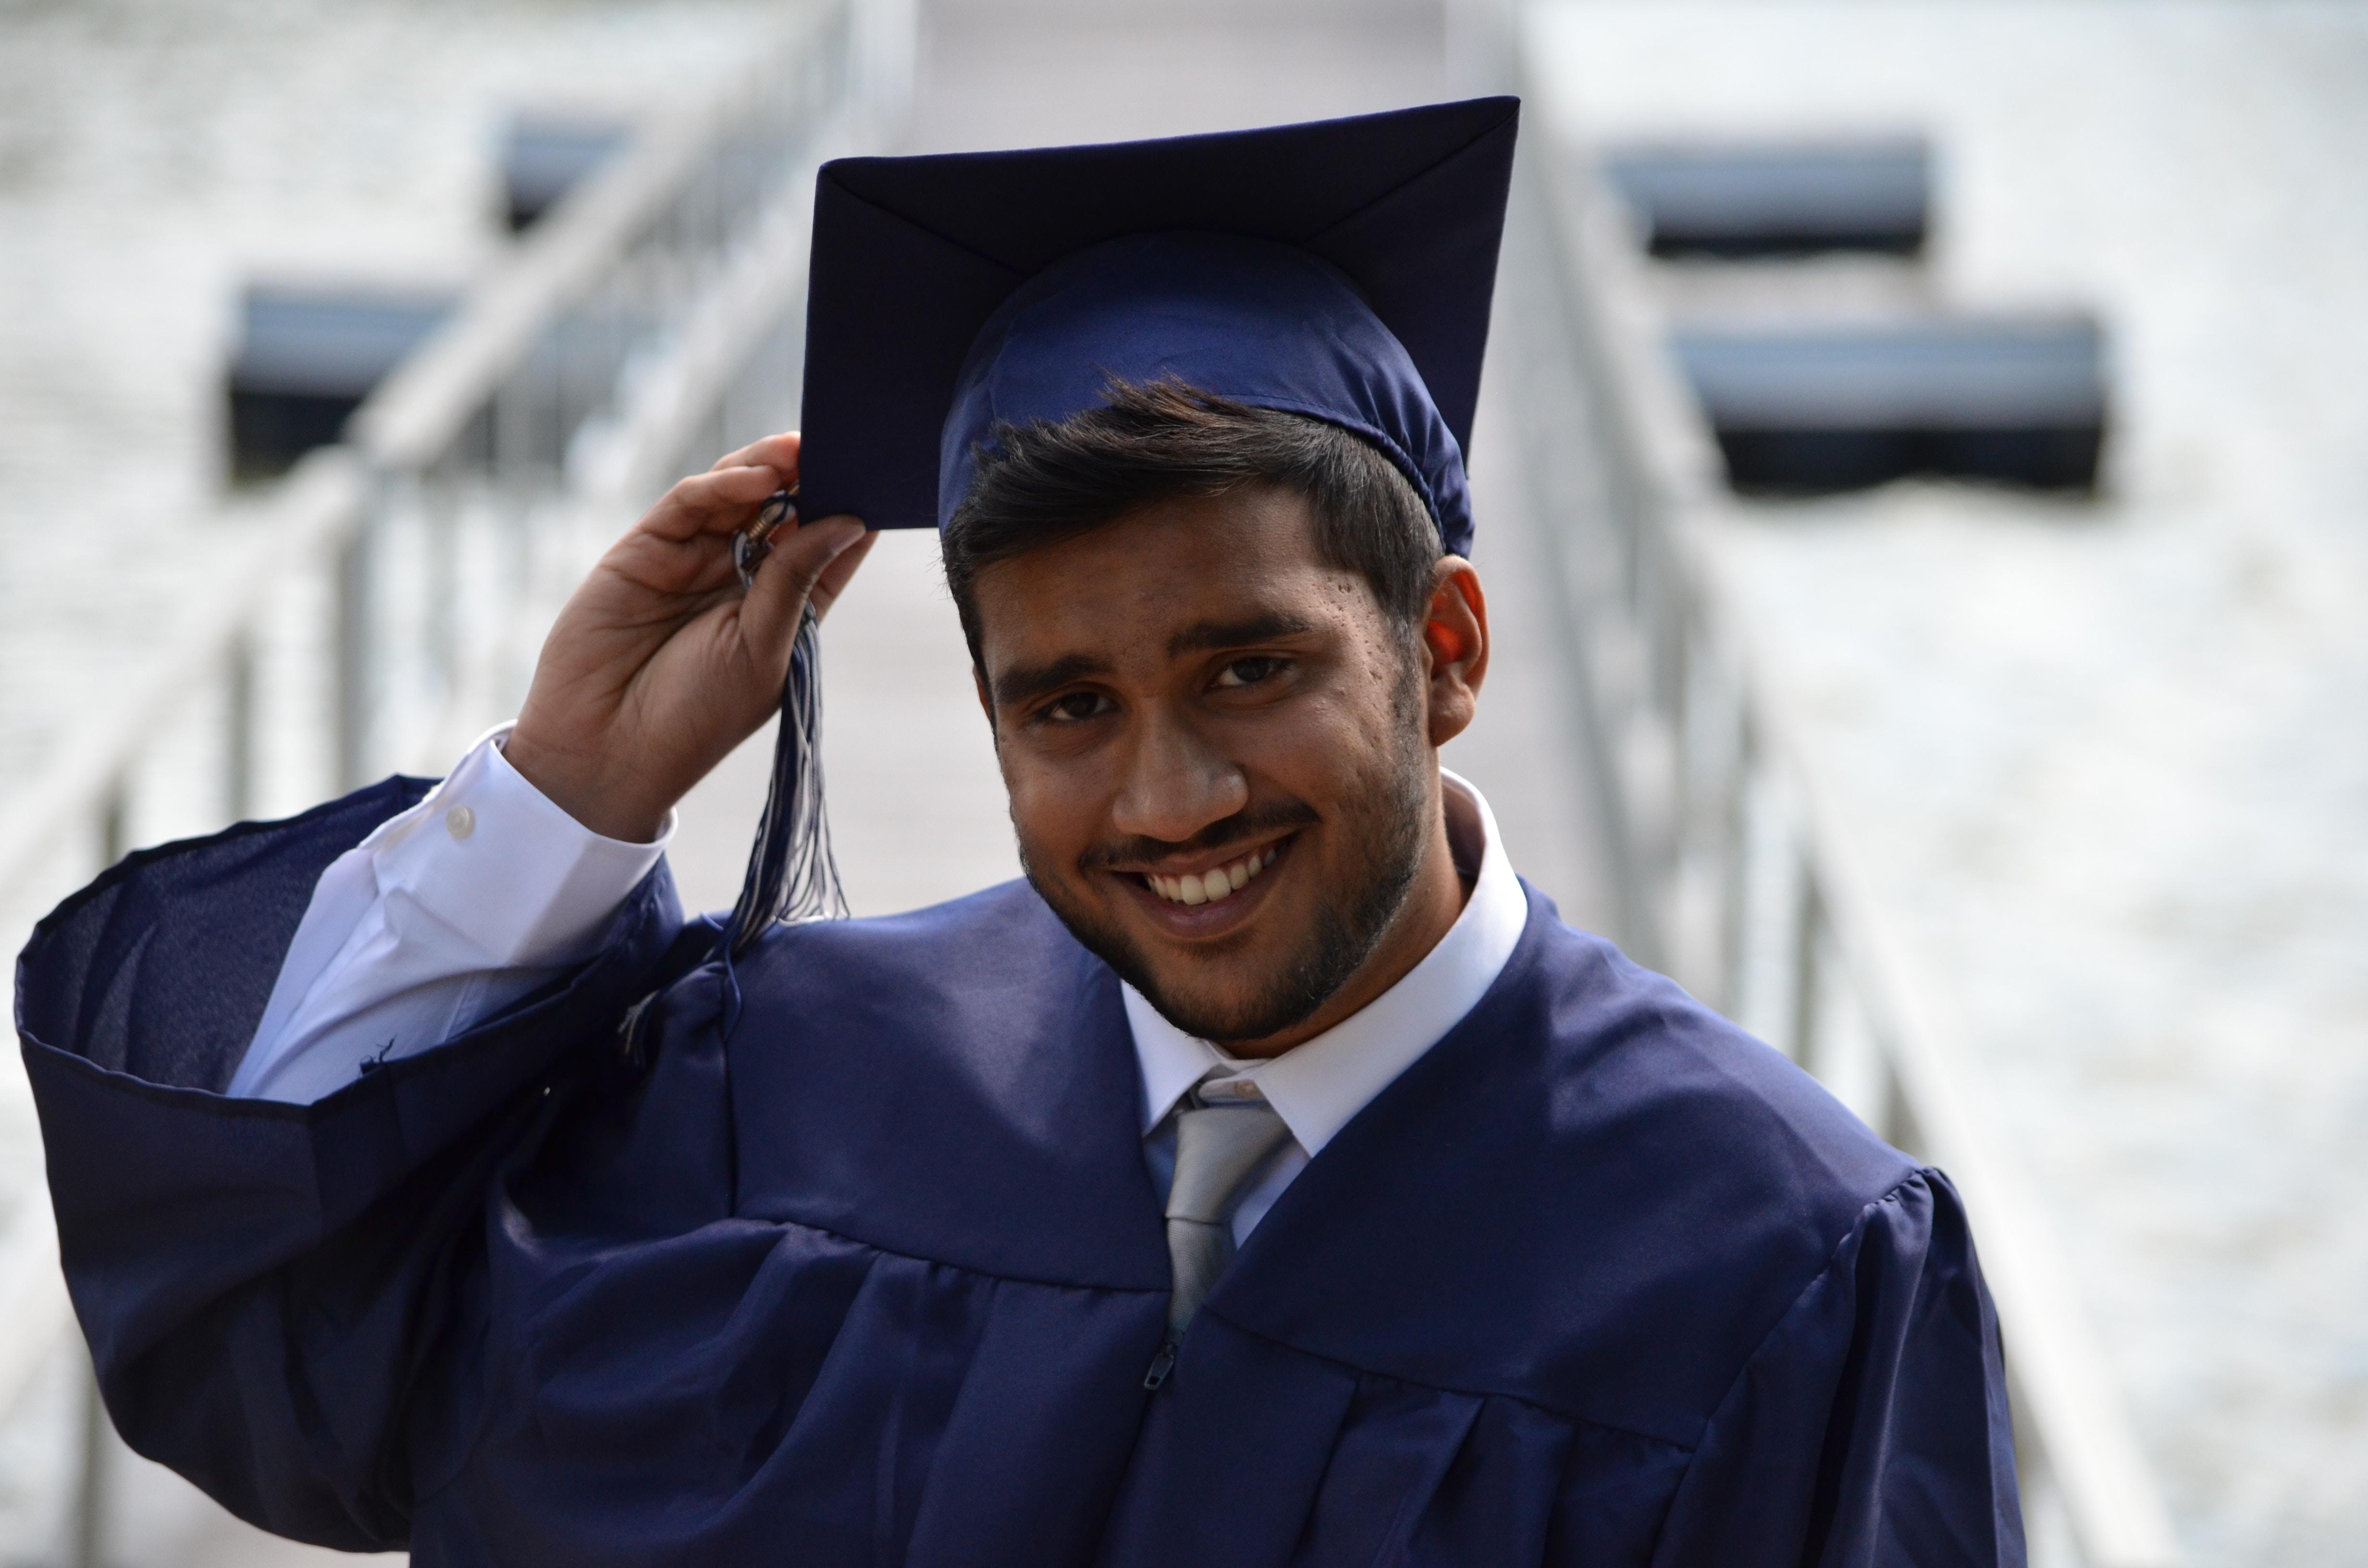 mba postgraduate degree graduation